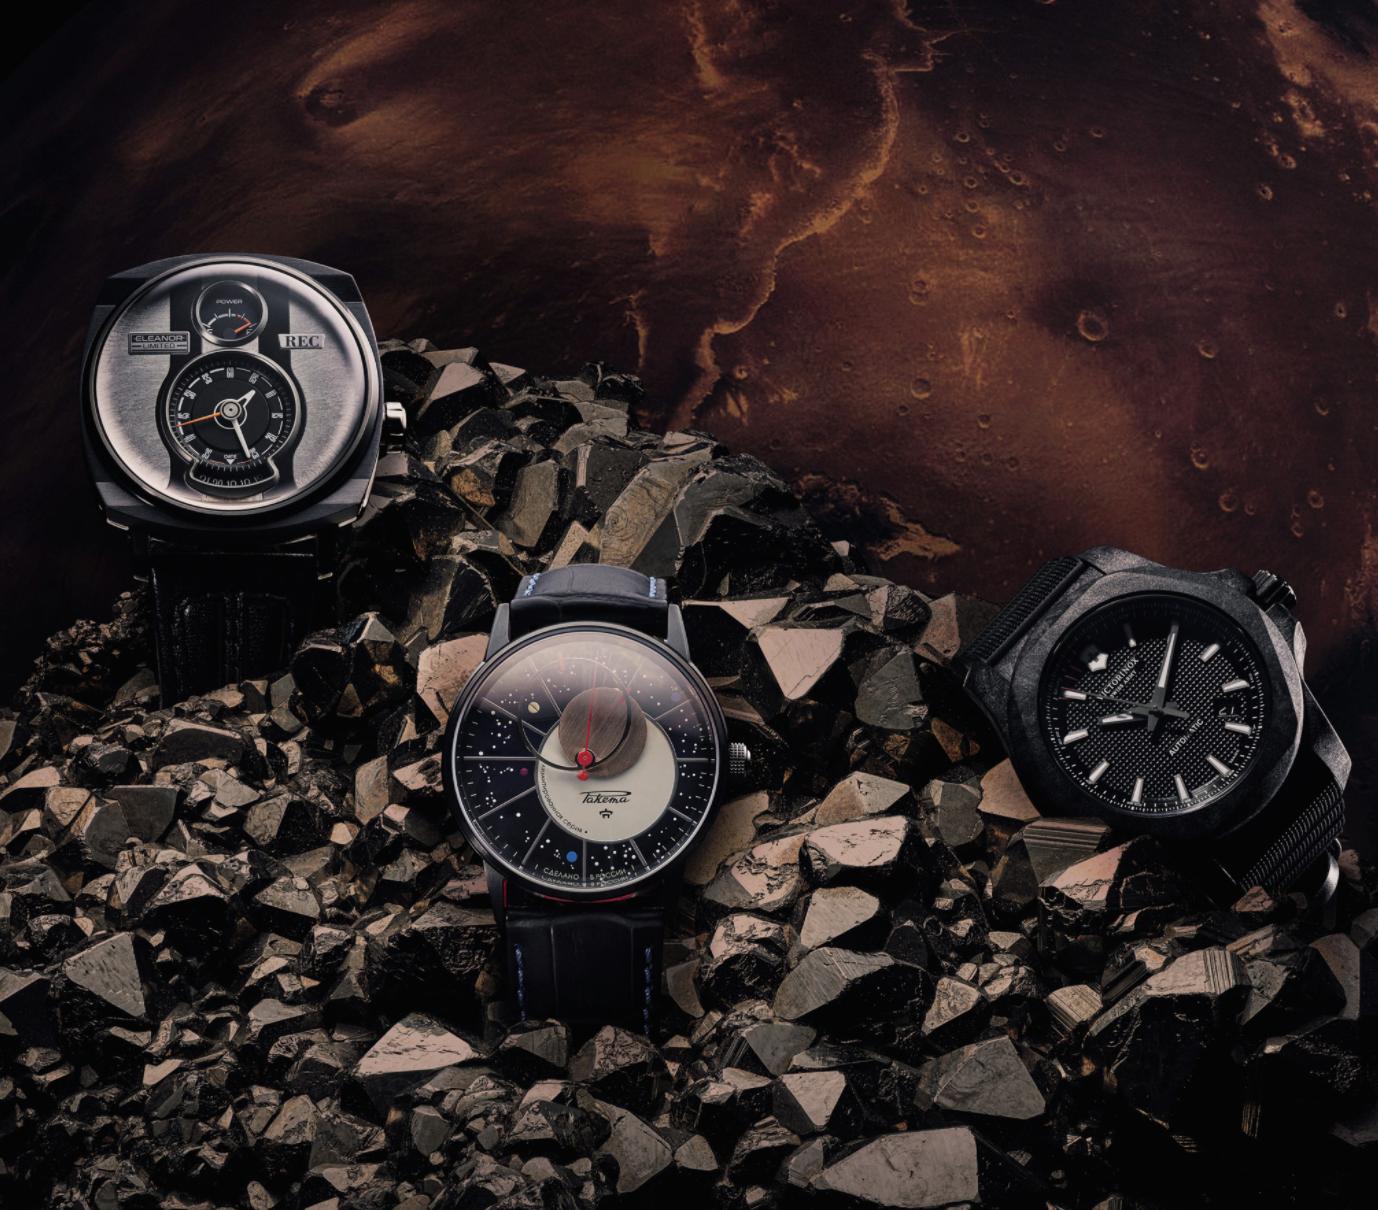 Beside Sport - Montres aventurières - De gauche à droite: REC Watches Eleanor P51 – Raketa Copernicus – Victorinox I.N.O.X Mechanical Carbon -